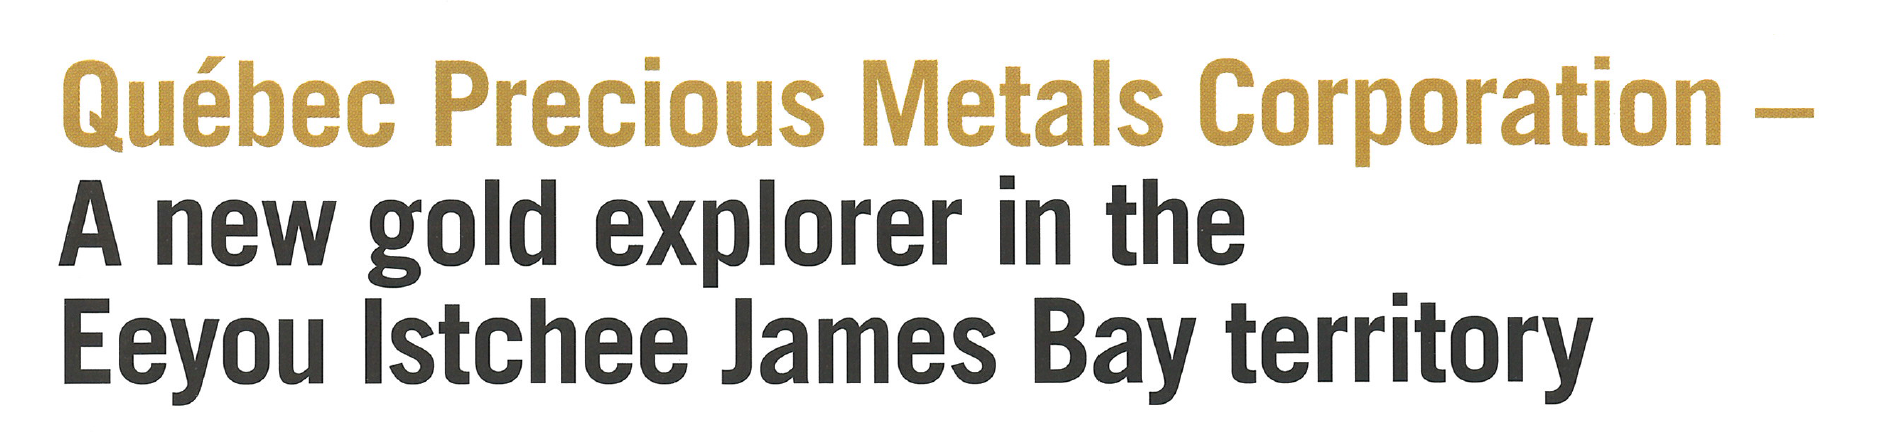 Quebec Precious Metals Corporation - A new gold explorer in the Eeyou Istchee James Bay territory